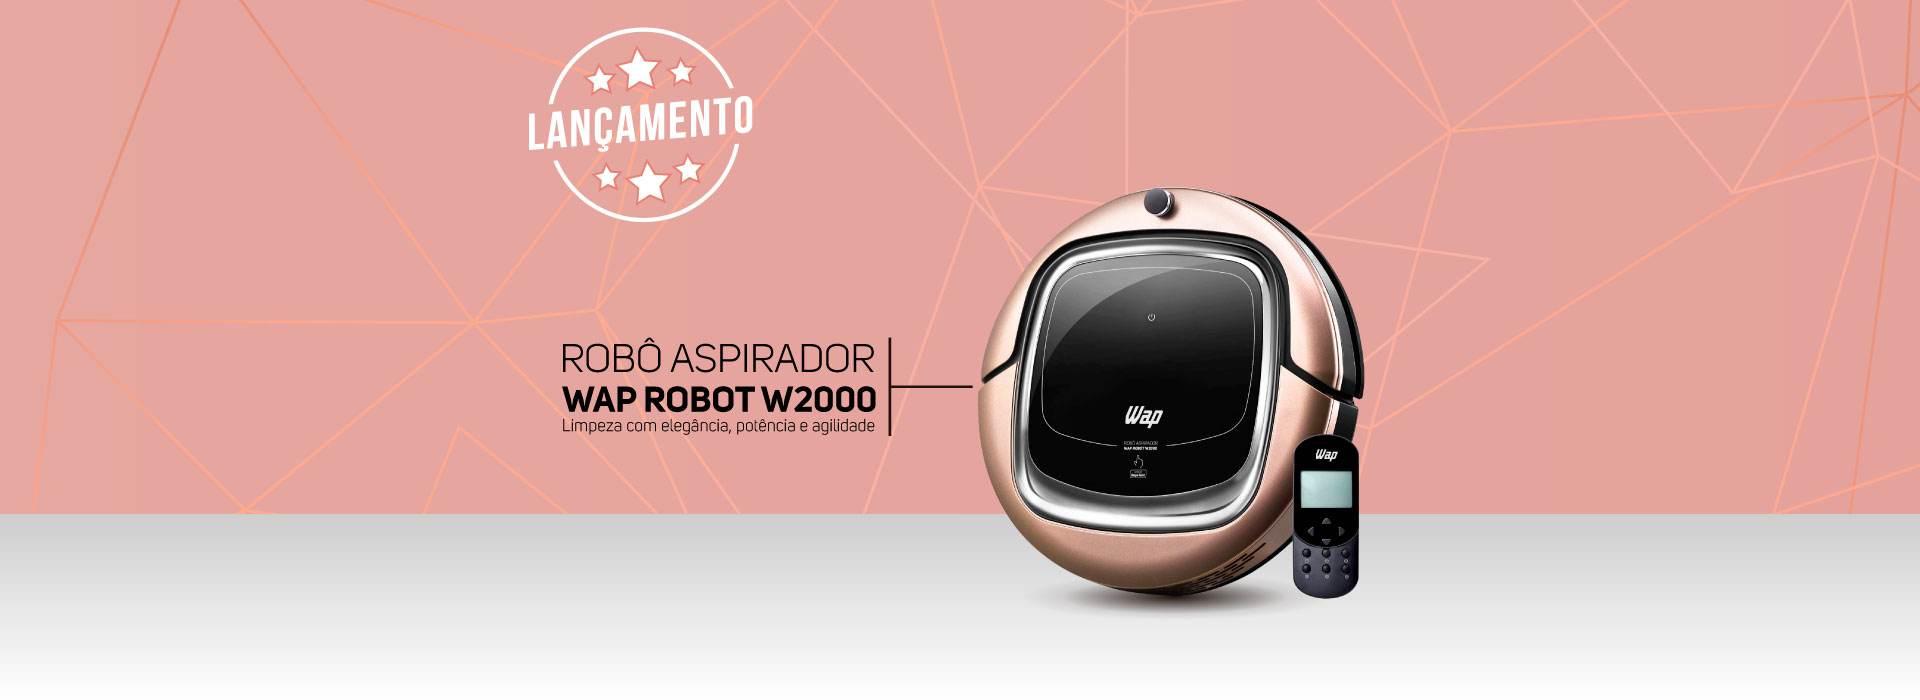 Robô Aspirador WAP W2000